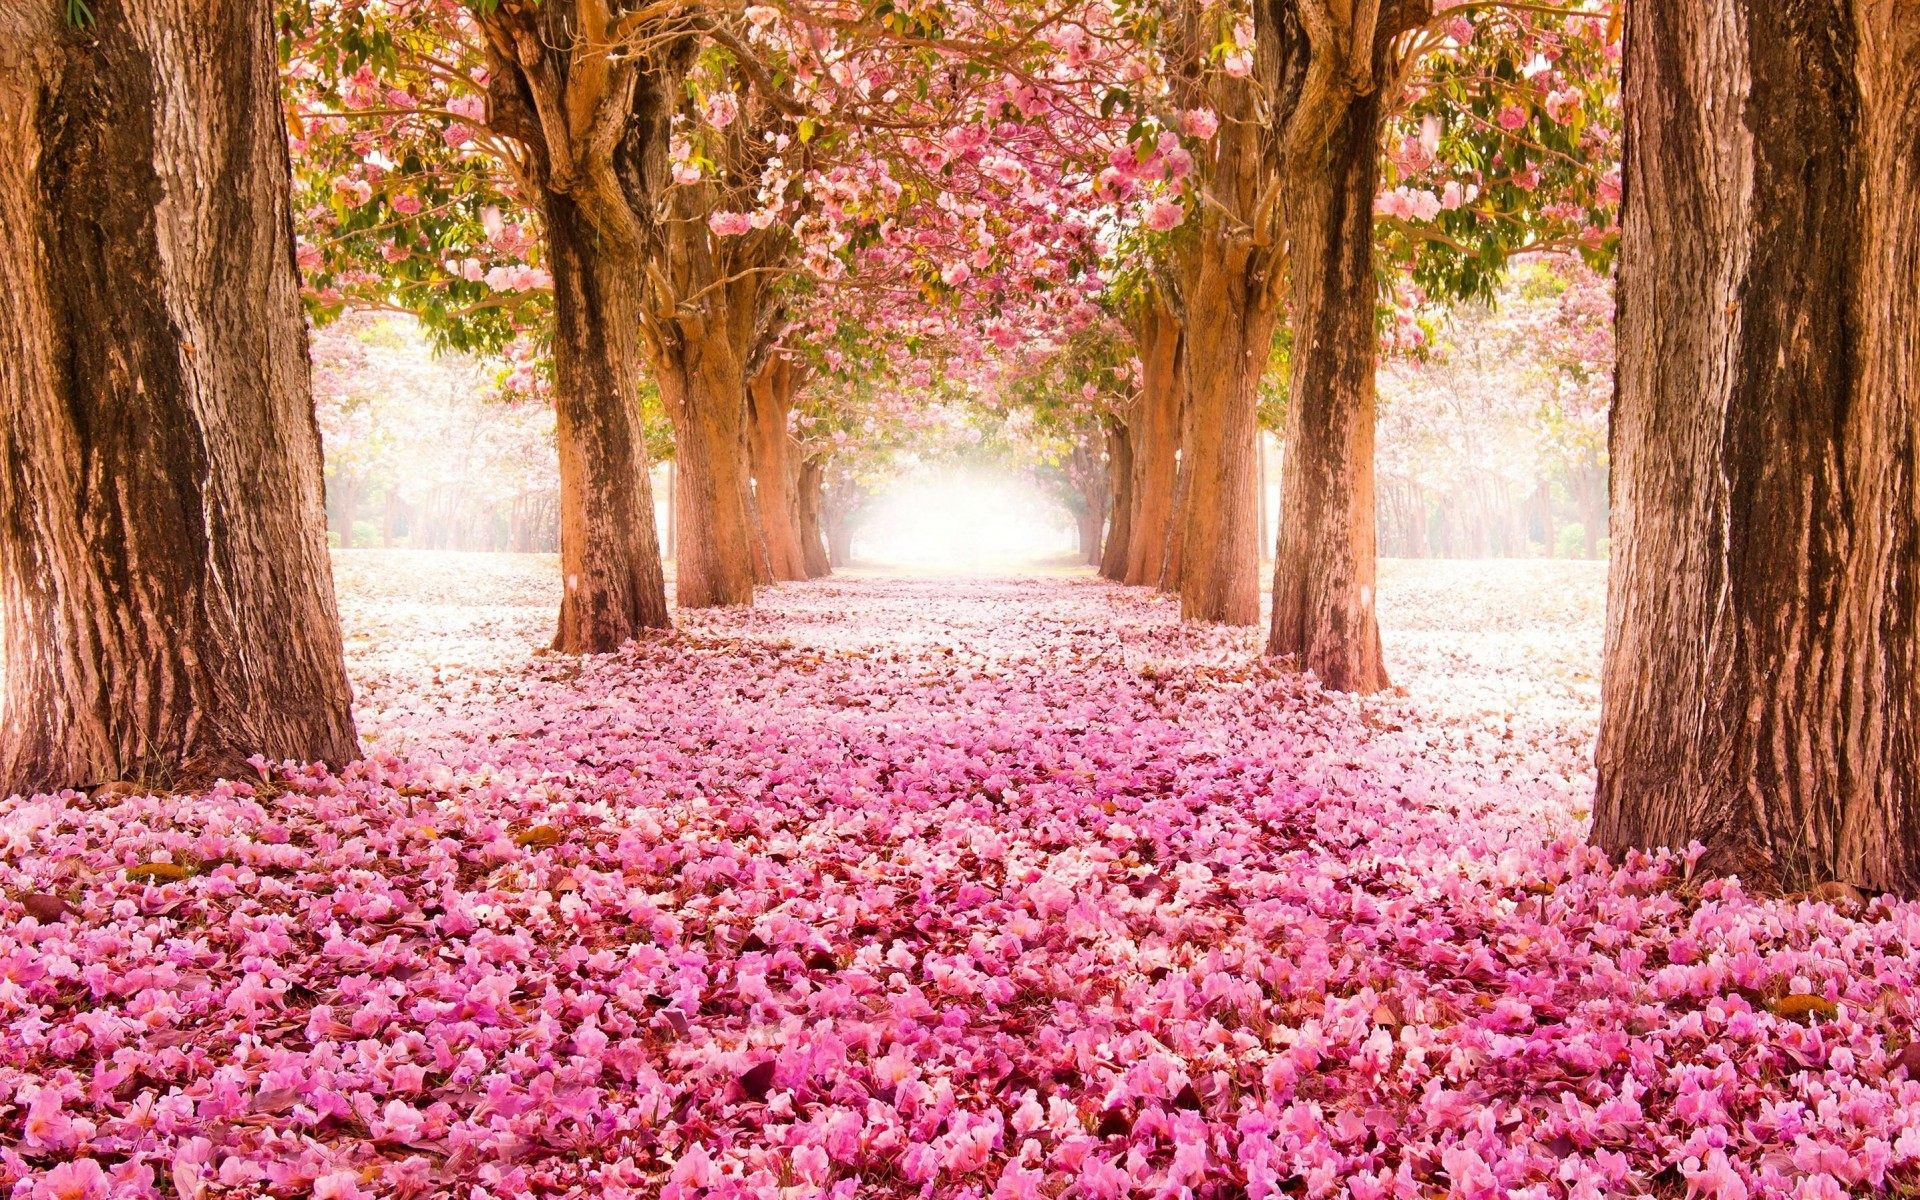 Pink flowers wallpaper gallery flower decoration ideas pink flowers wallpaper image collections flower decoration ideas pink flower wallpapers choice image flower decoration ideas mightylinksfo